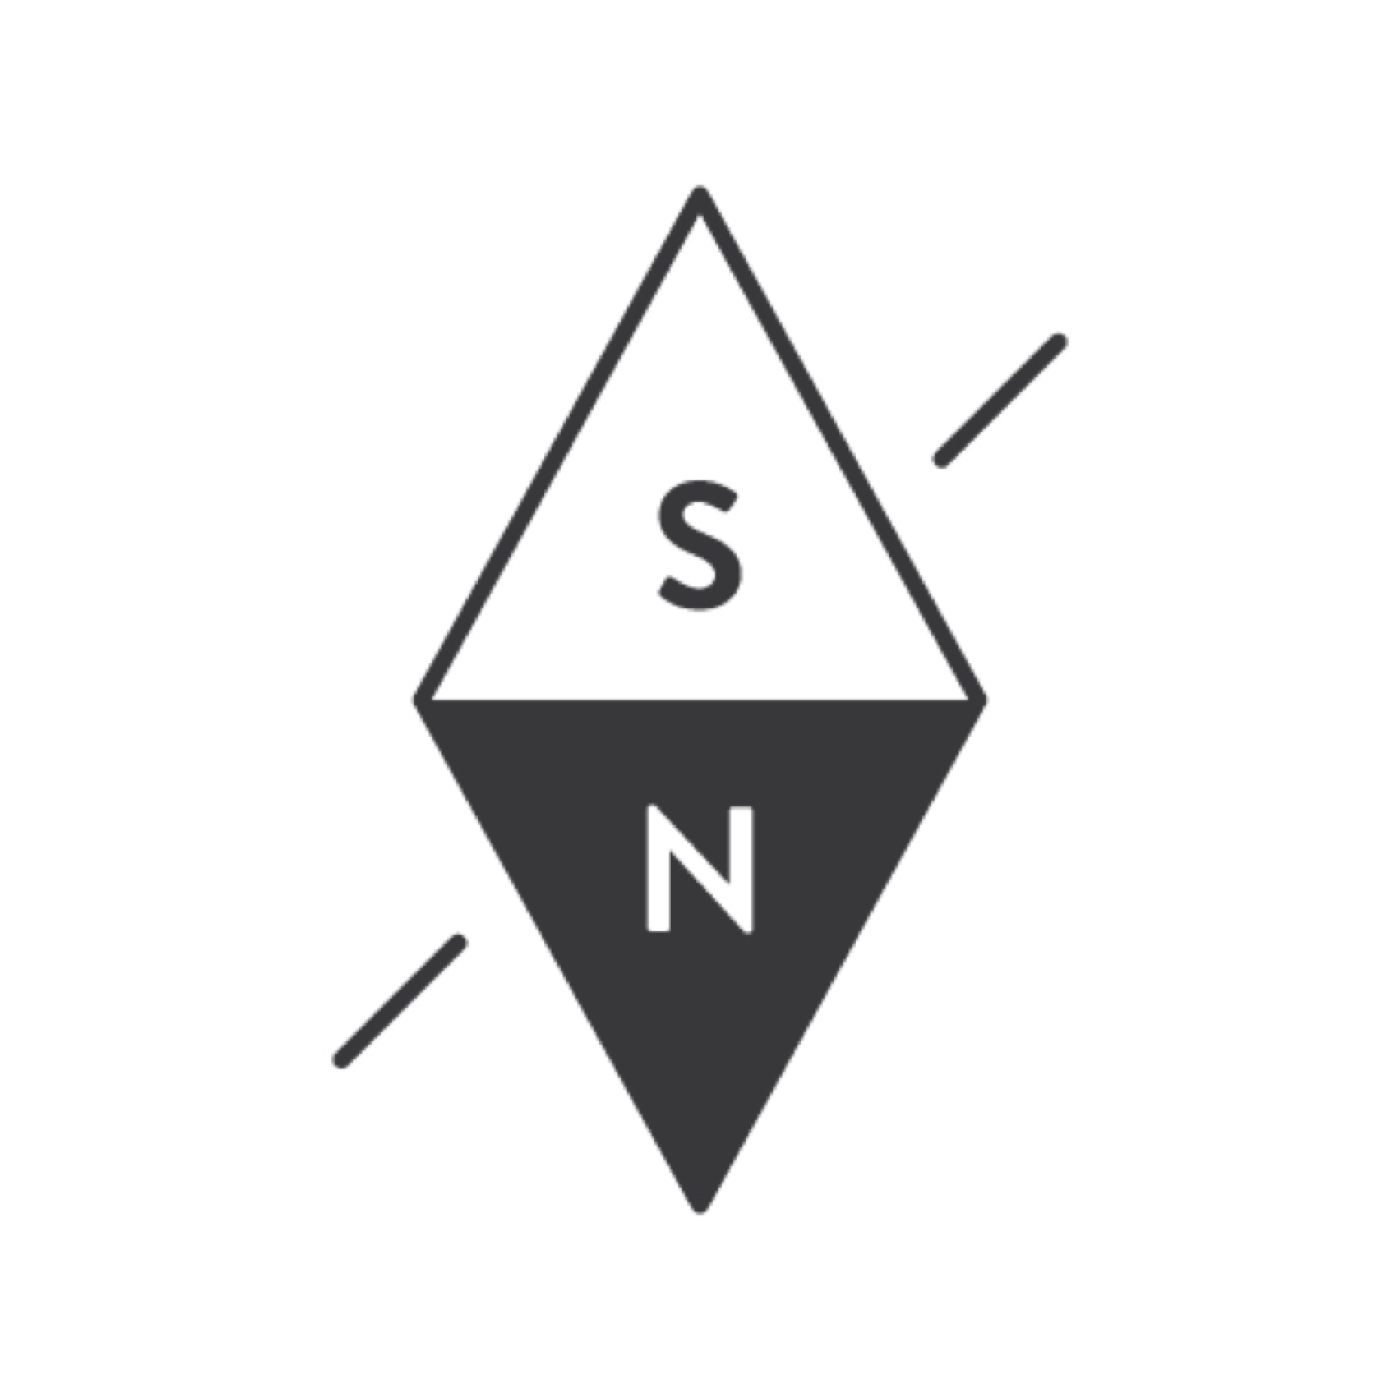 SN.jpg